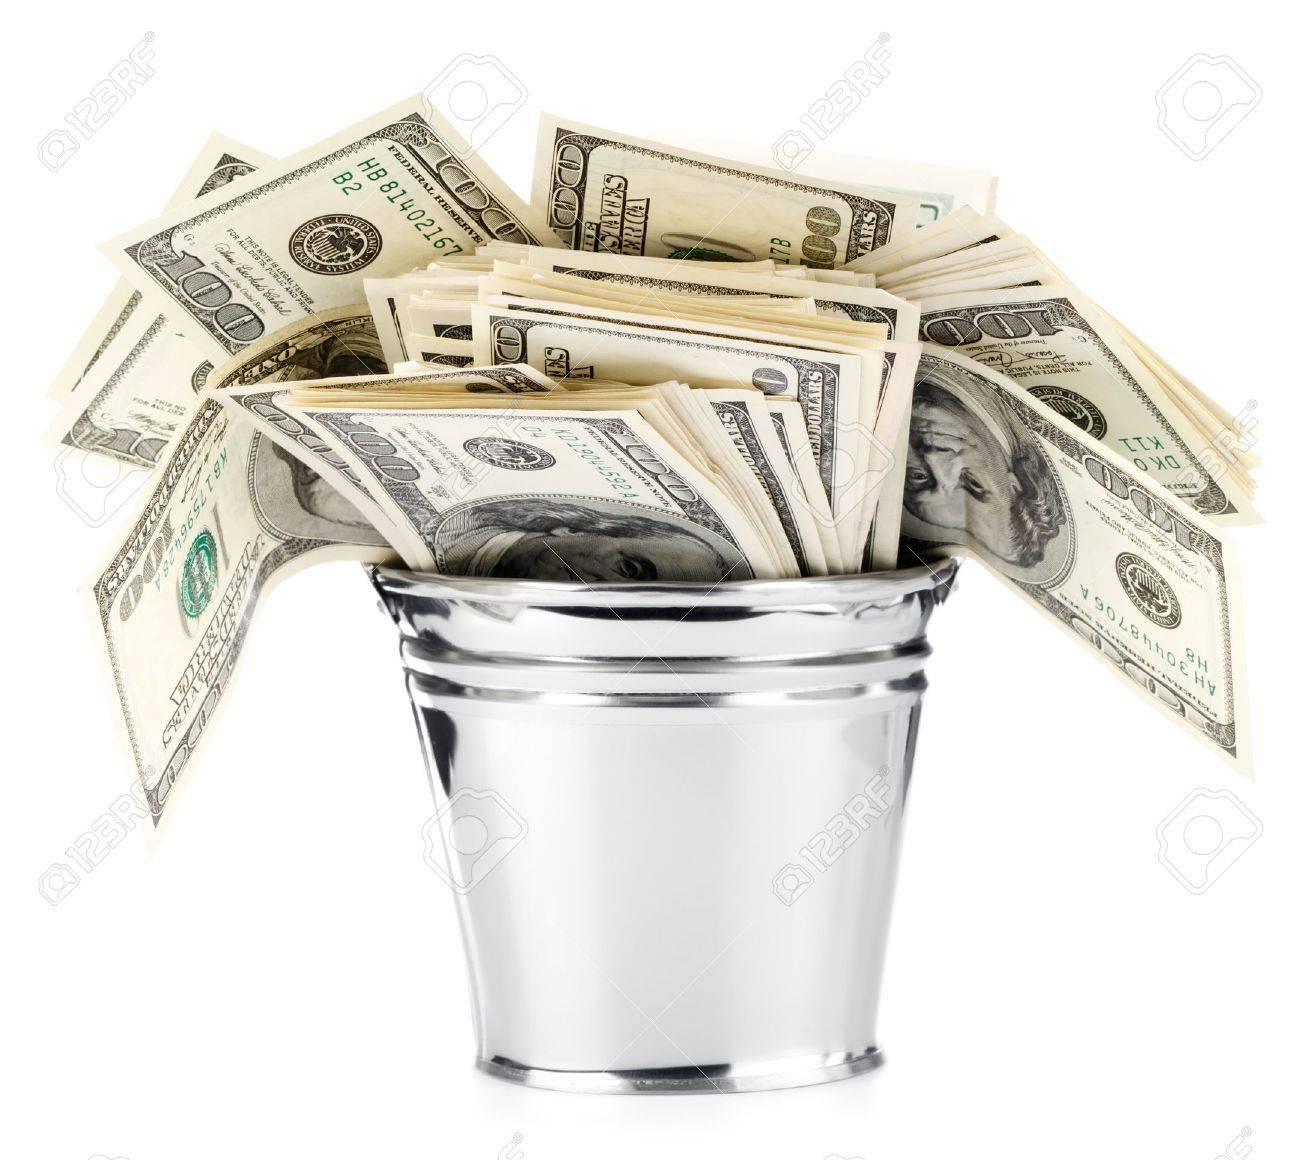 Dollar in pail - 11237092